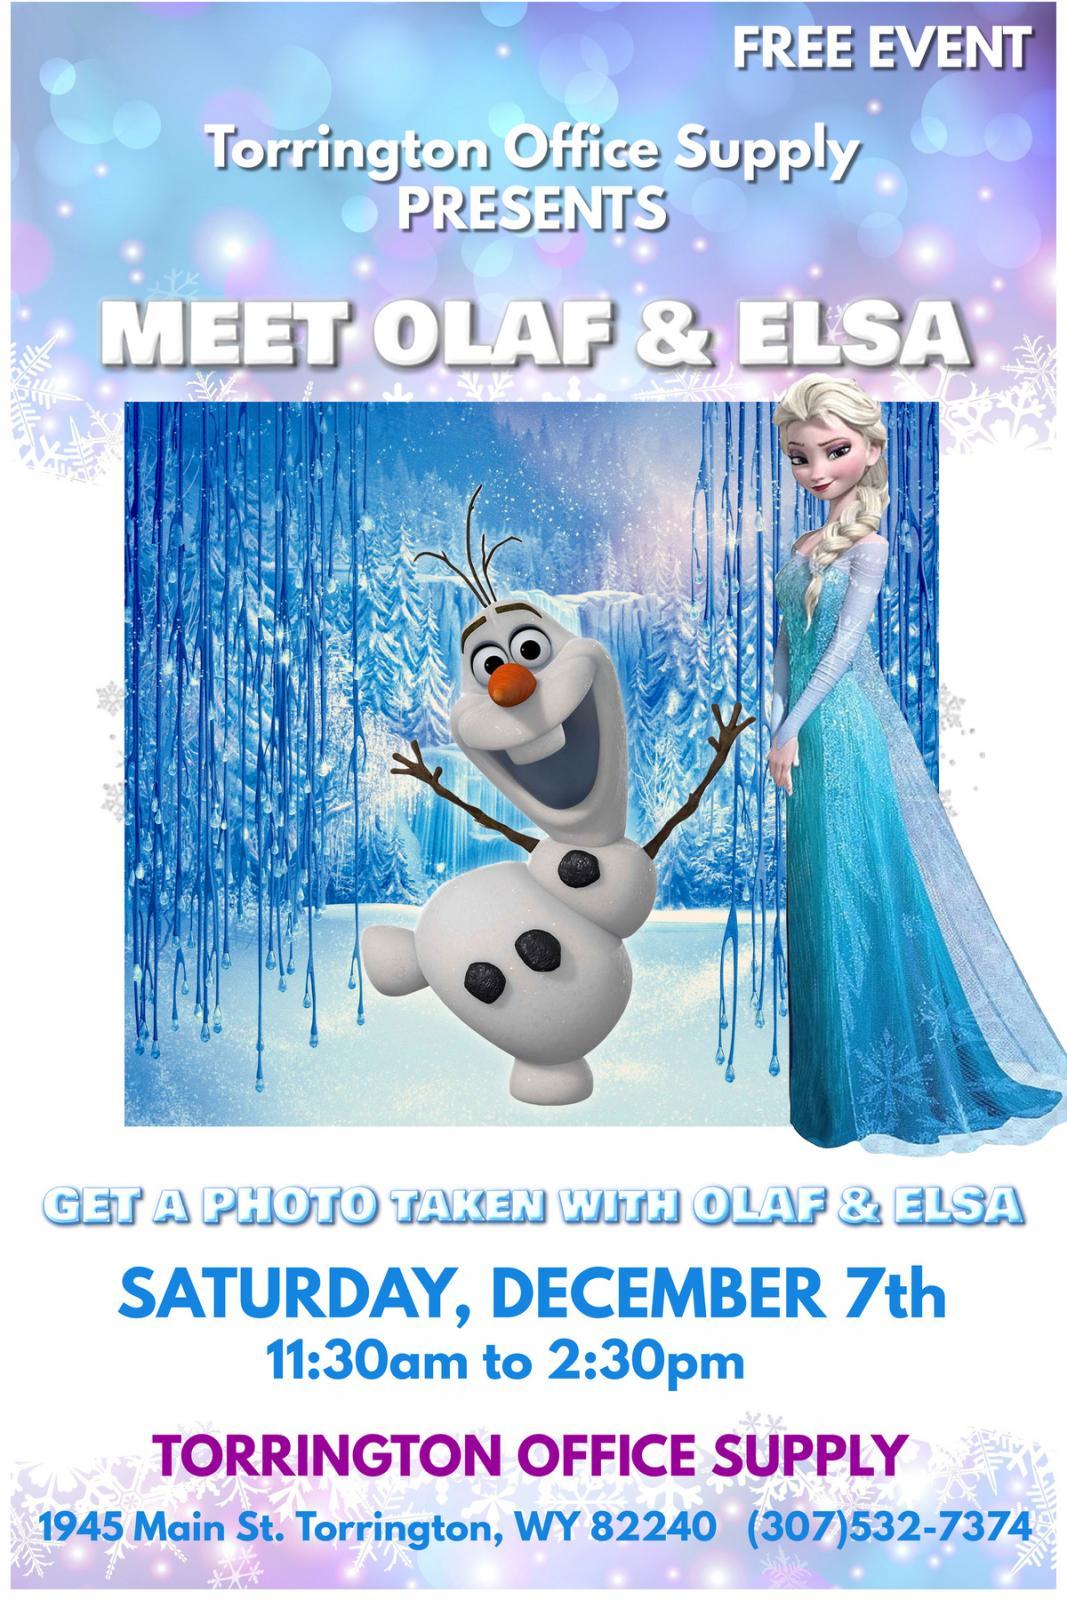 Meet Olaf & Elsa Photo